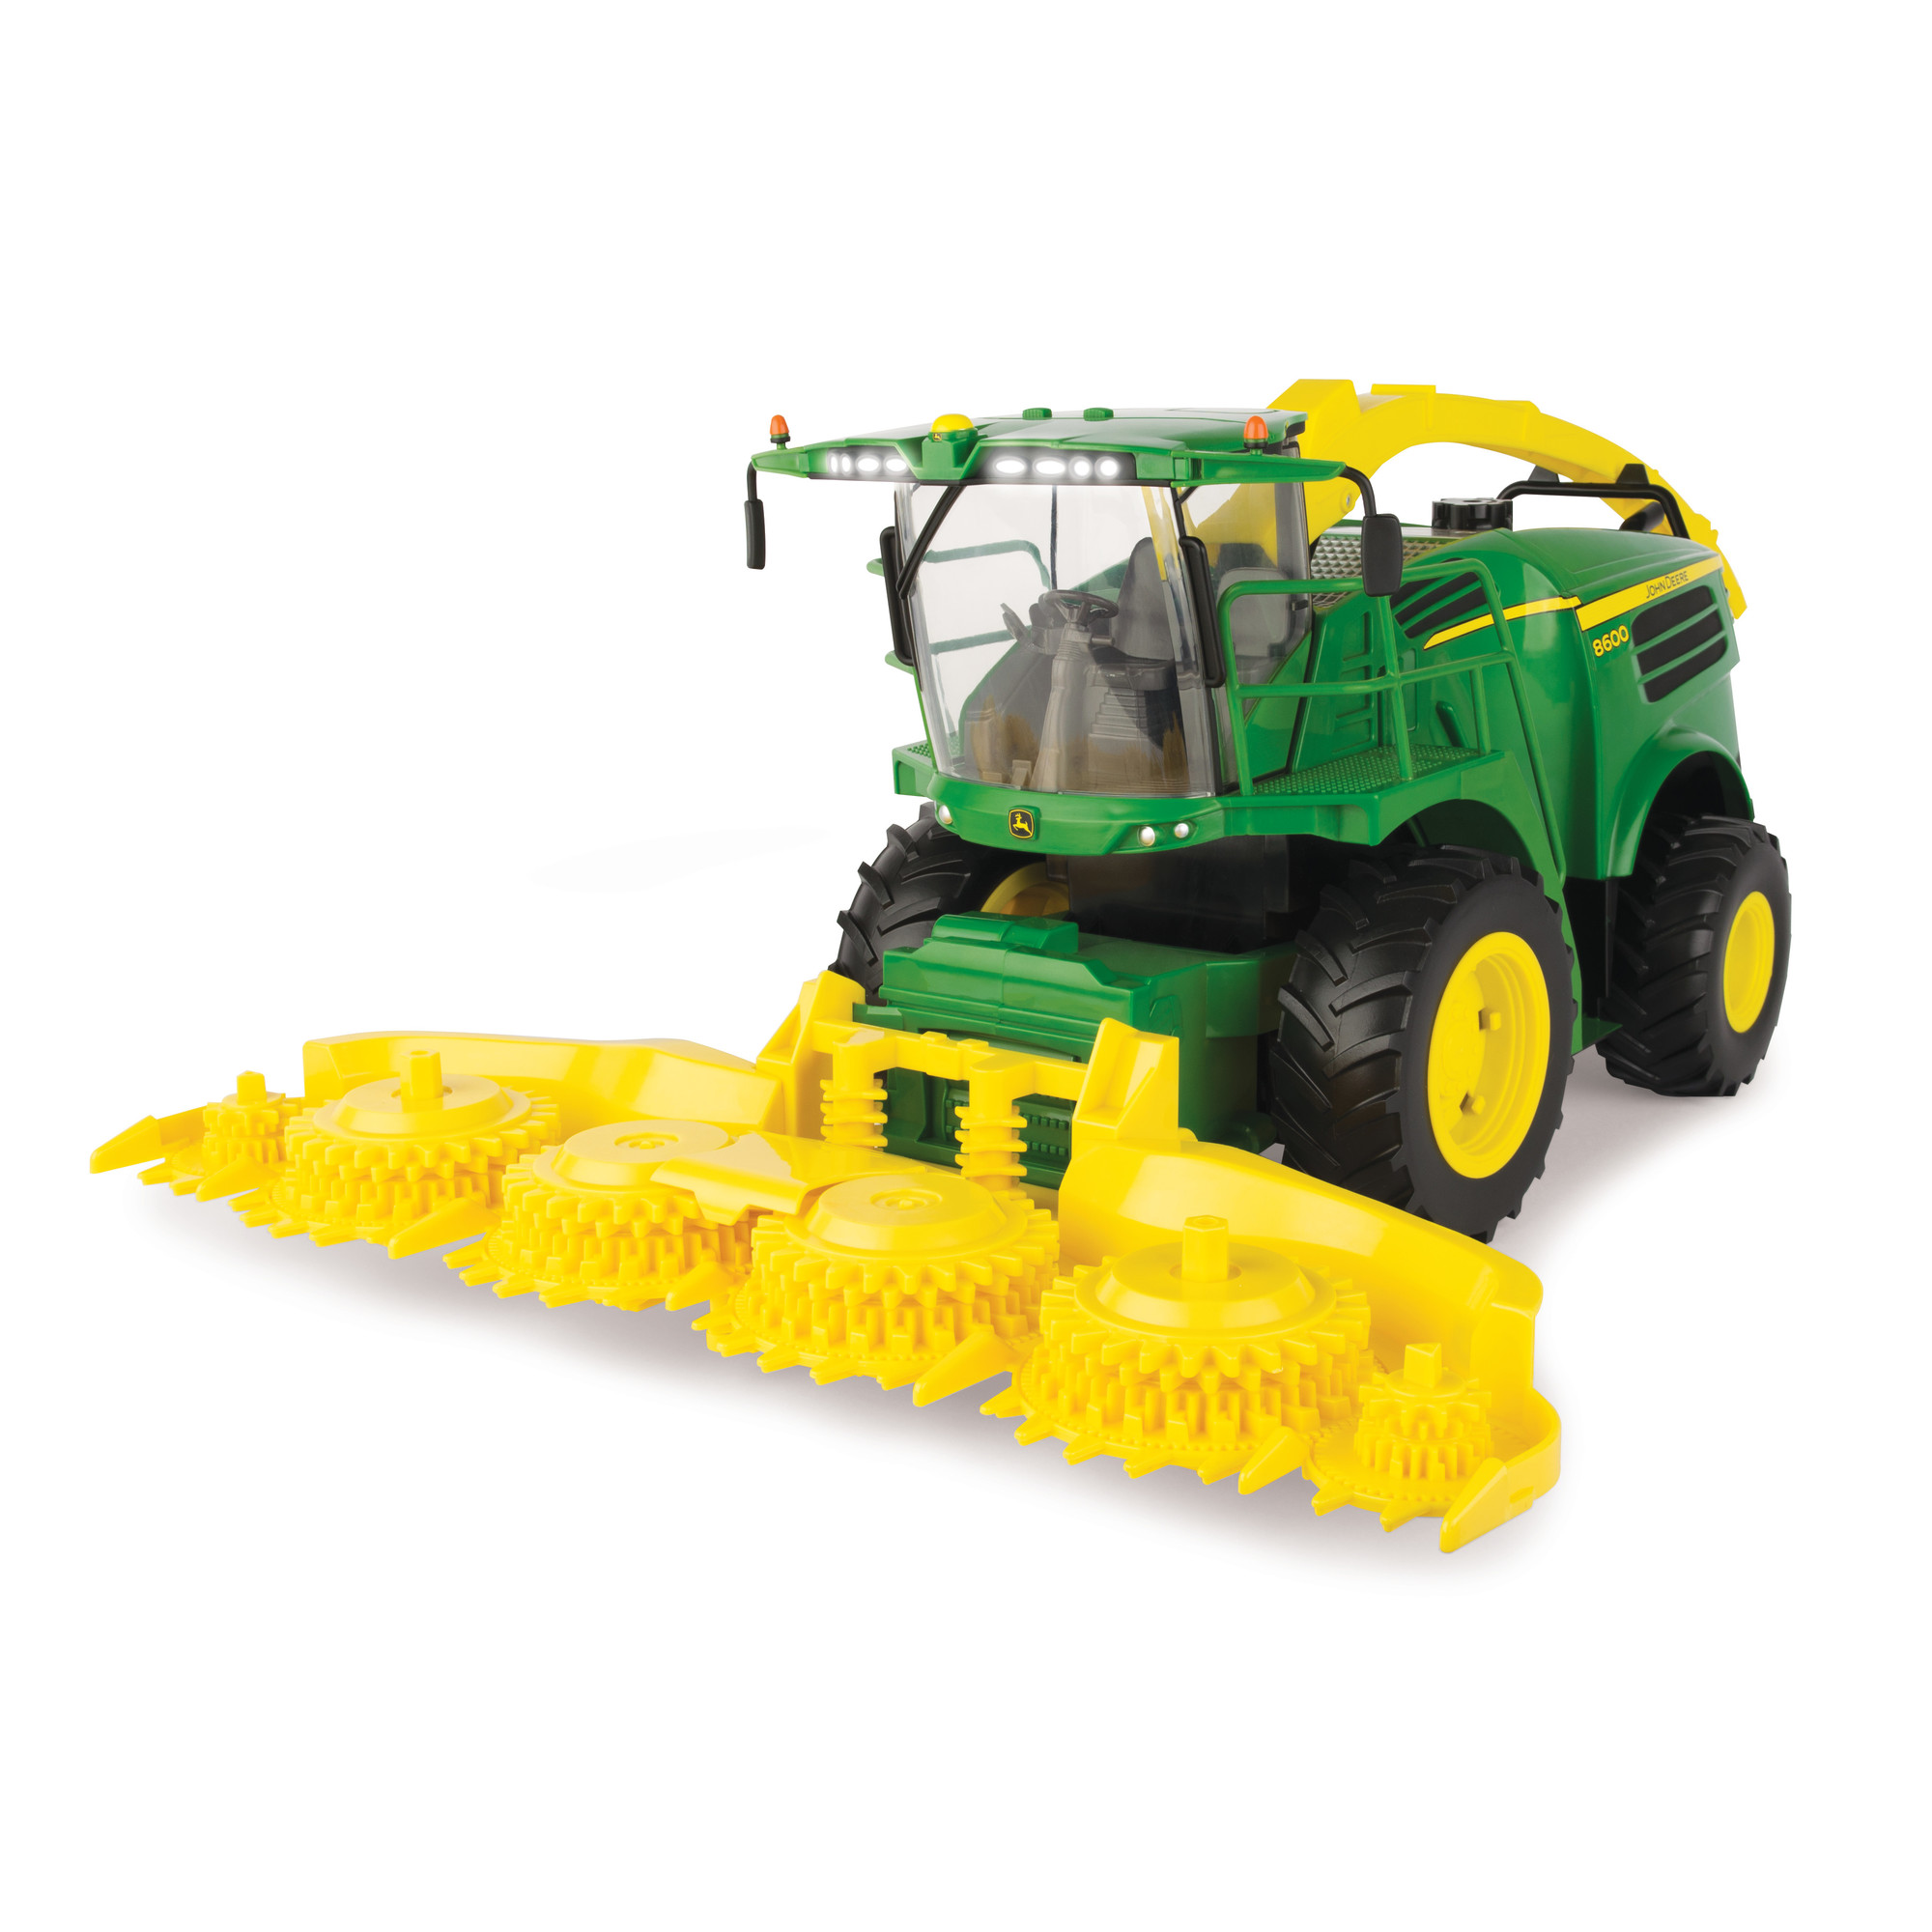 1:16 John Deere Forage Harvester by Tomy Inc